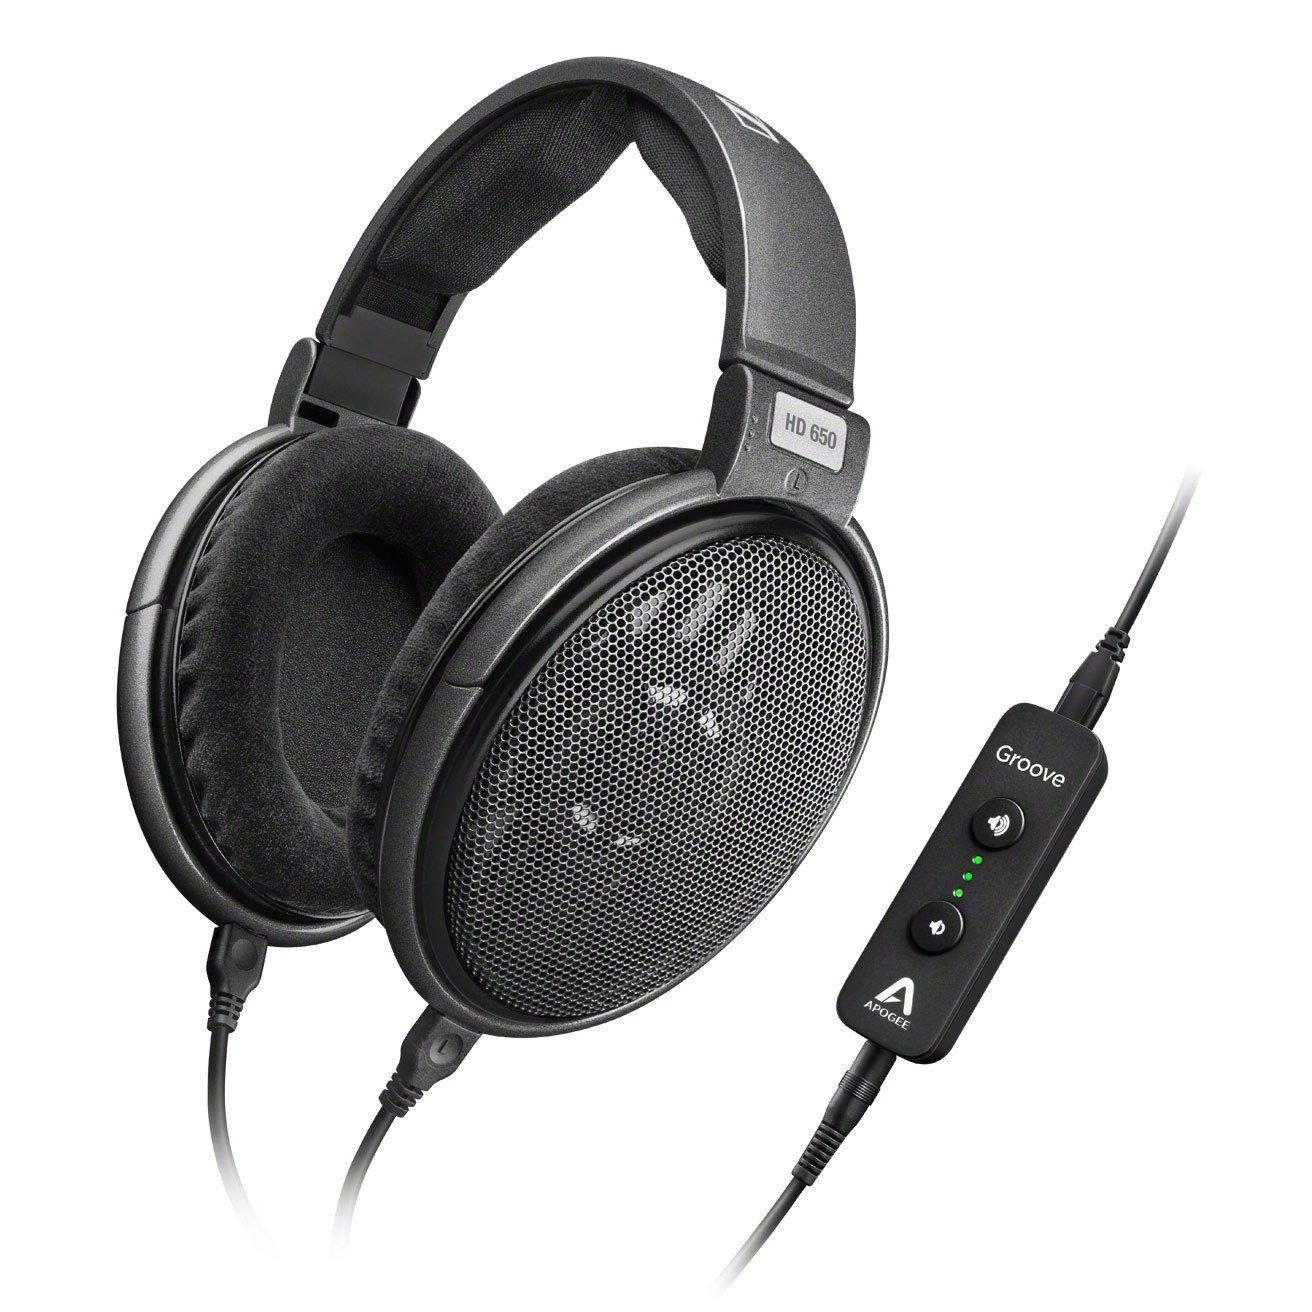 Sennheiser HD 650 Headphones + Apogee Groove USB DAC Amp - $499.95 Plus Free Shipping